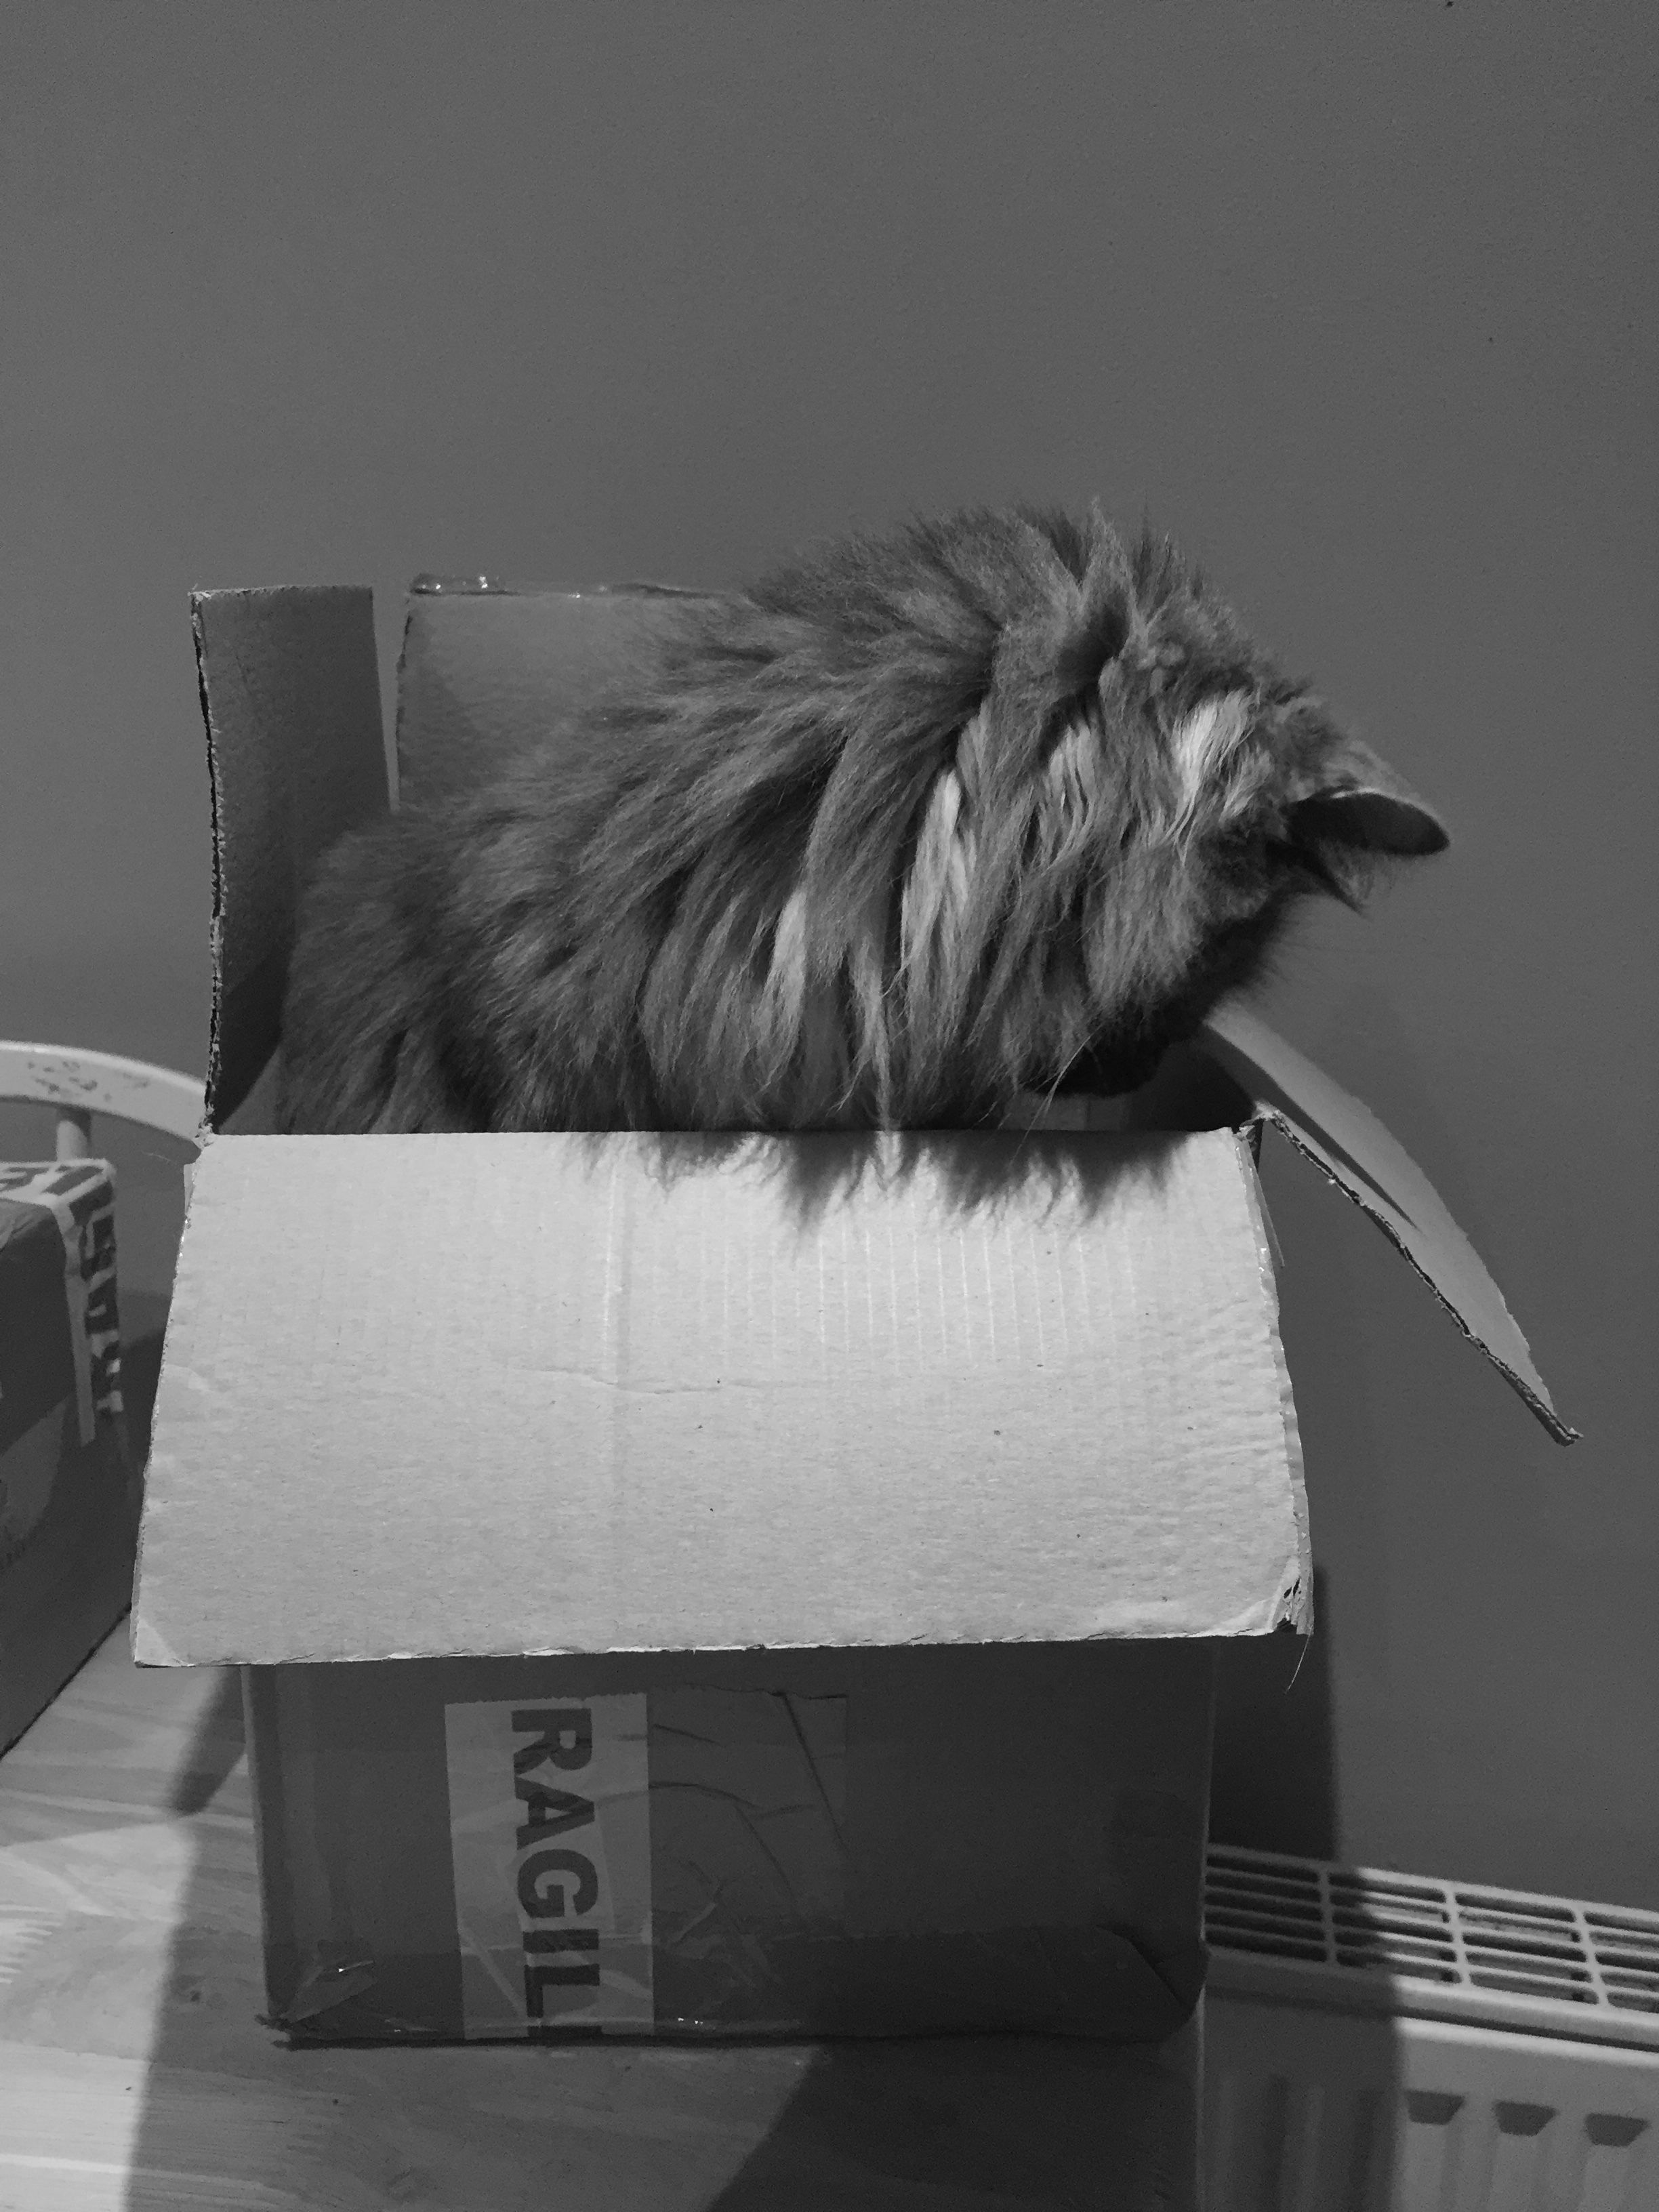 If I fits, I sits :) Luna loves 'helping' me pack.